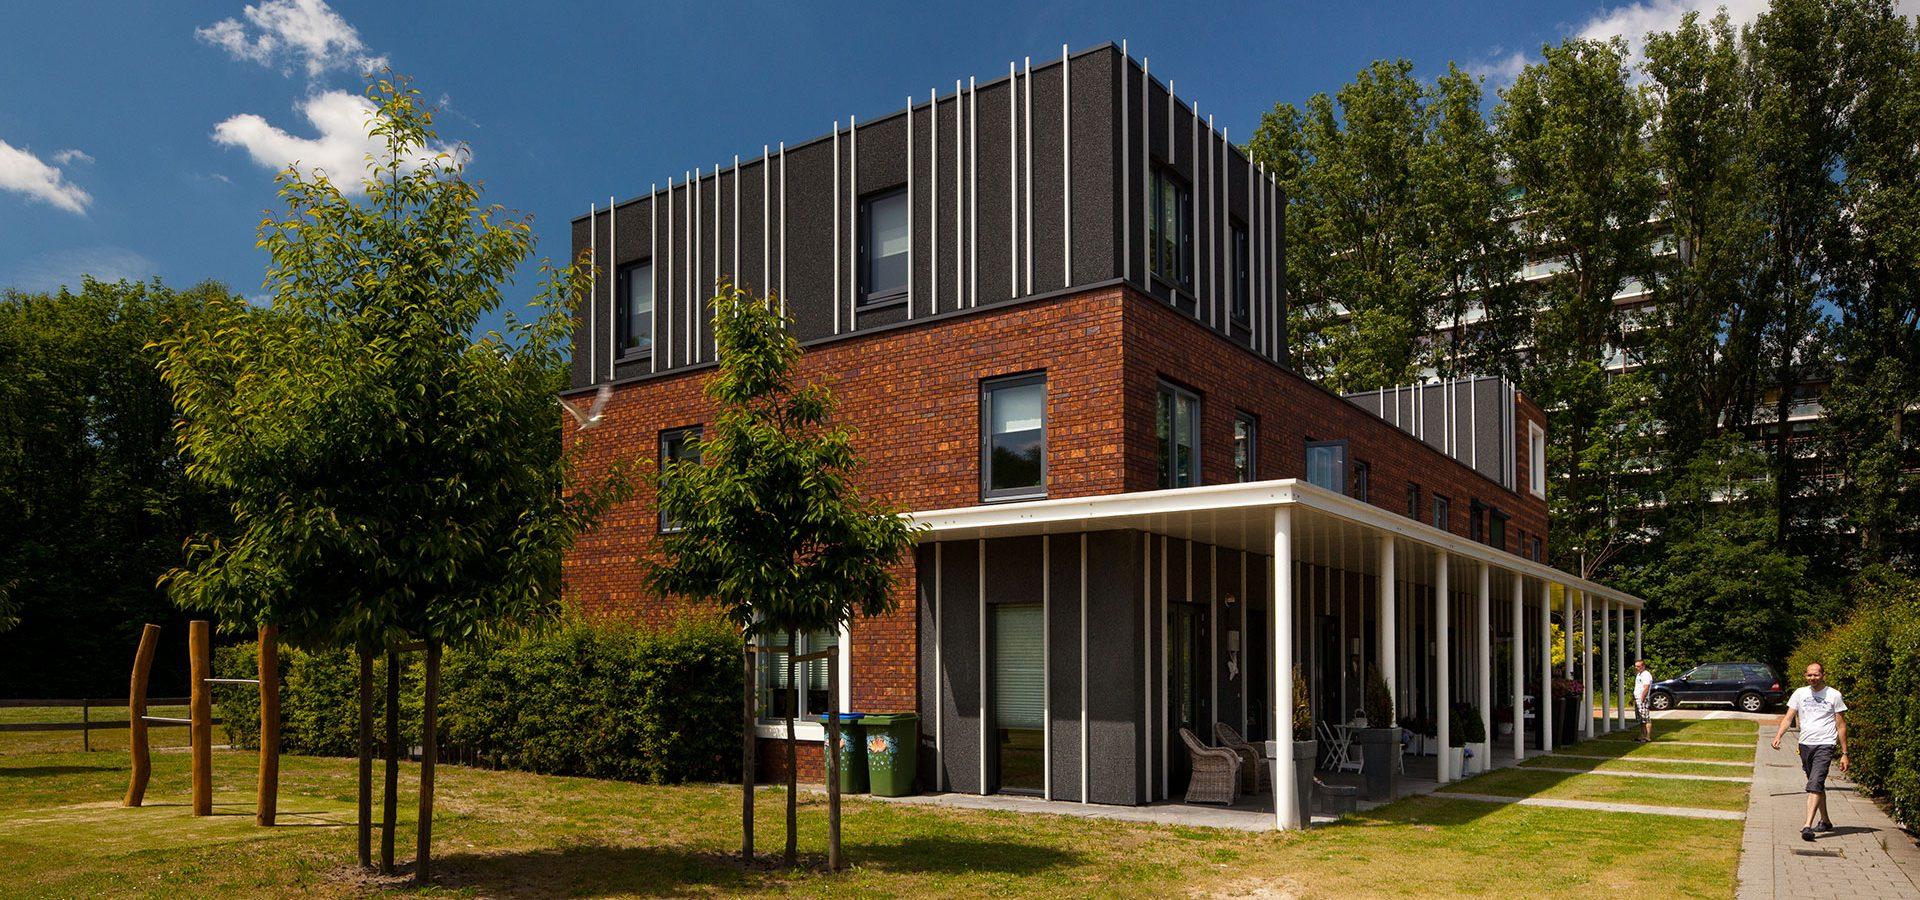 FARO architecten Dijkzone Oedevlietsepark Rotterdam 08